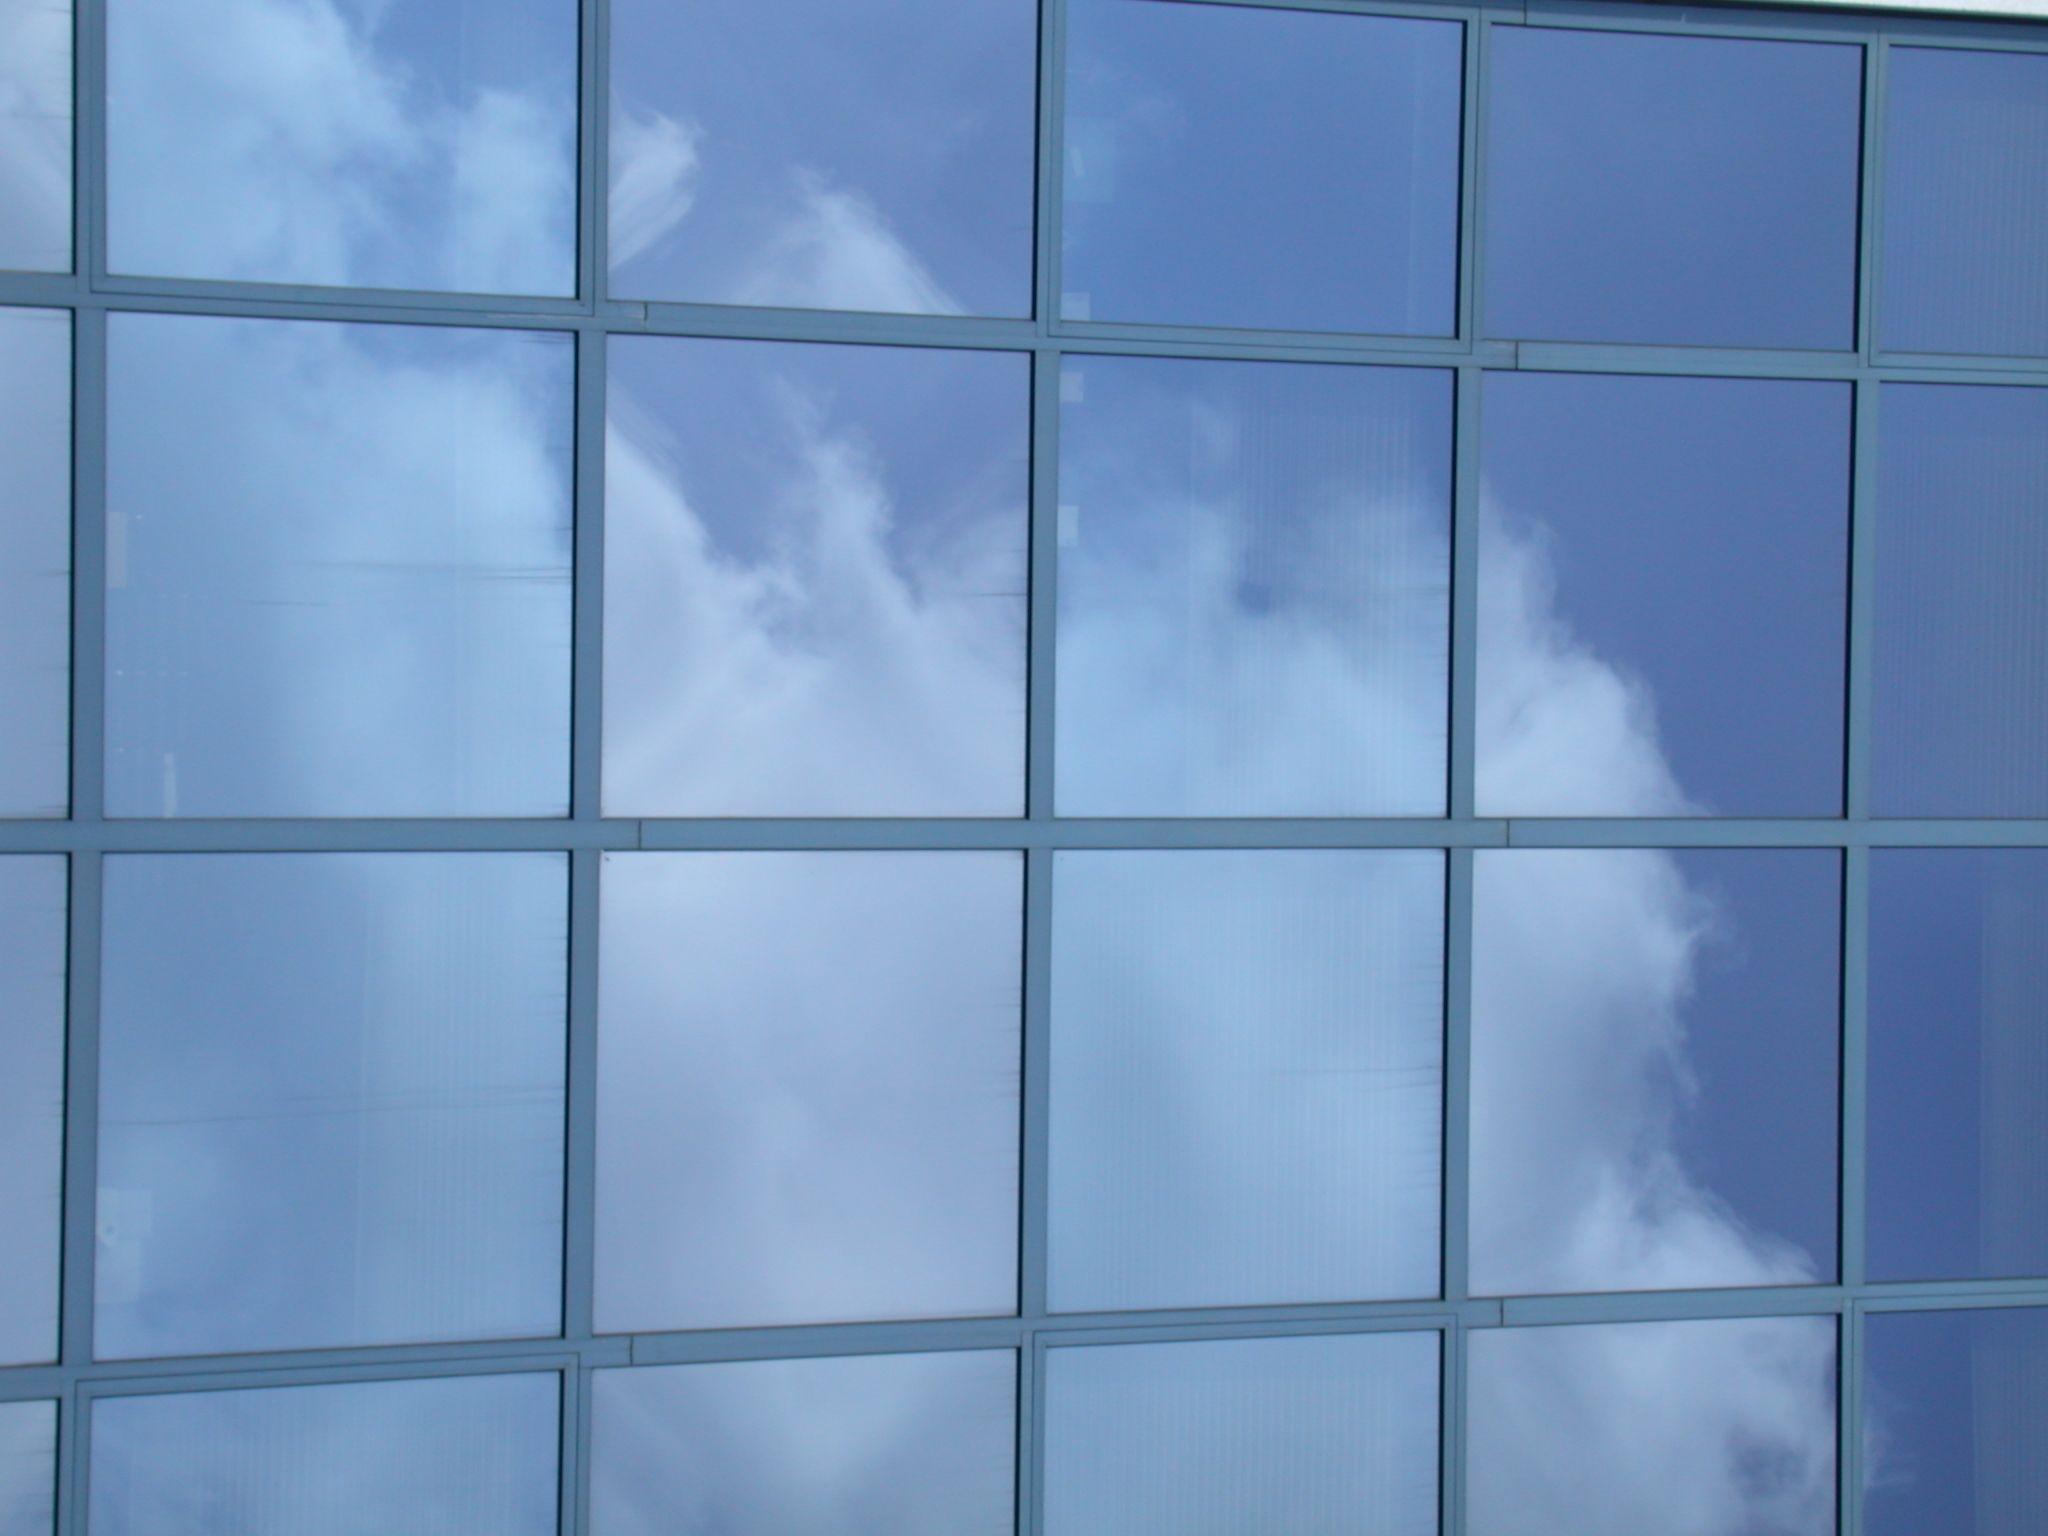 Glass Windows Building Clouds Sky Clouds Glass Window Glass